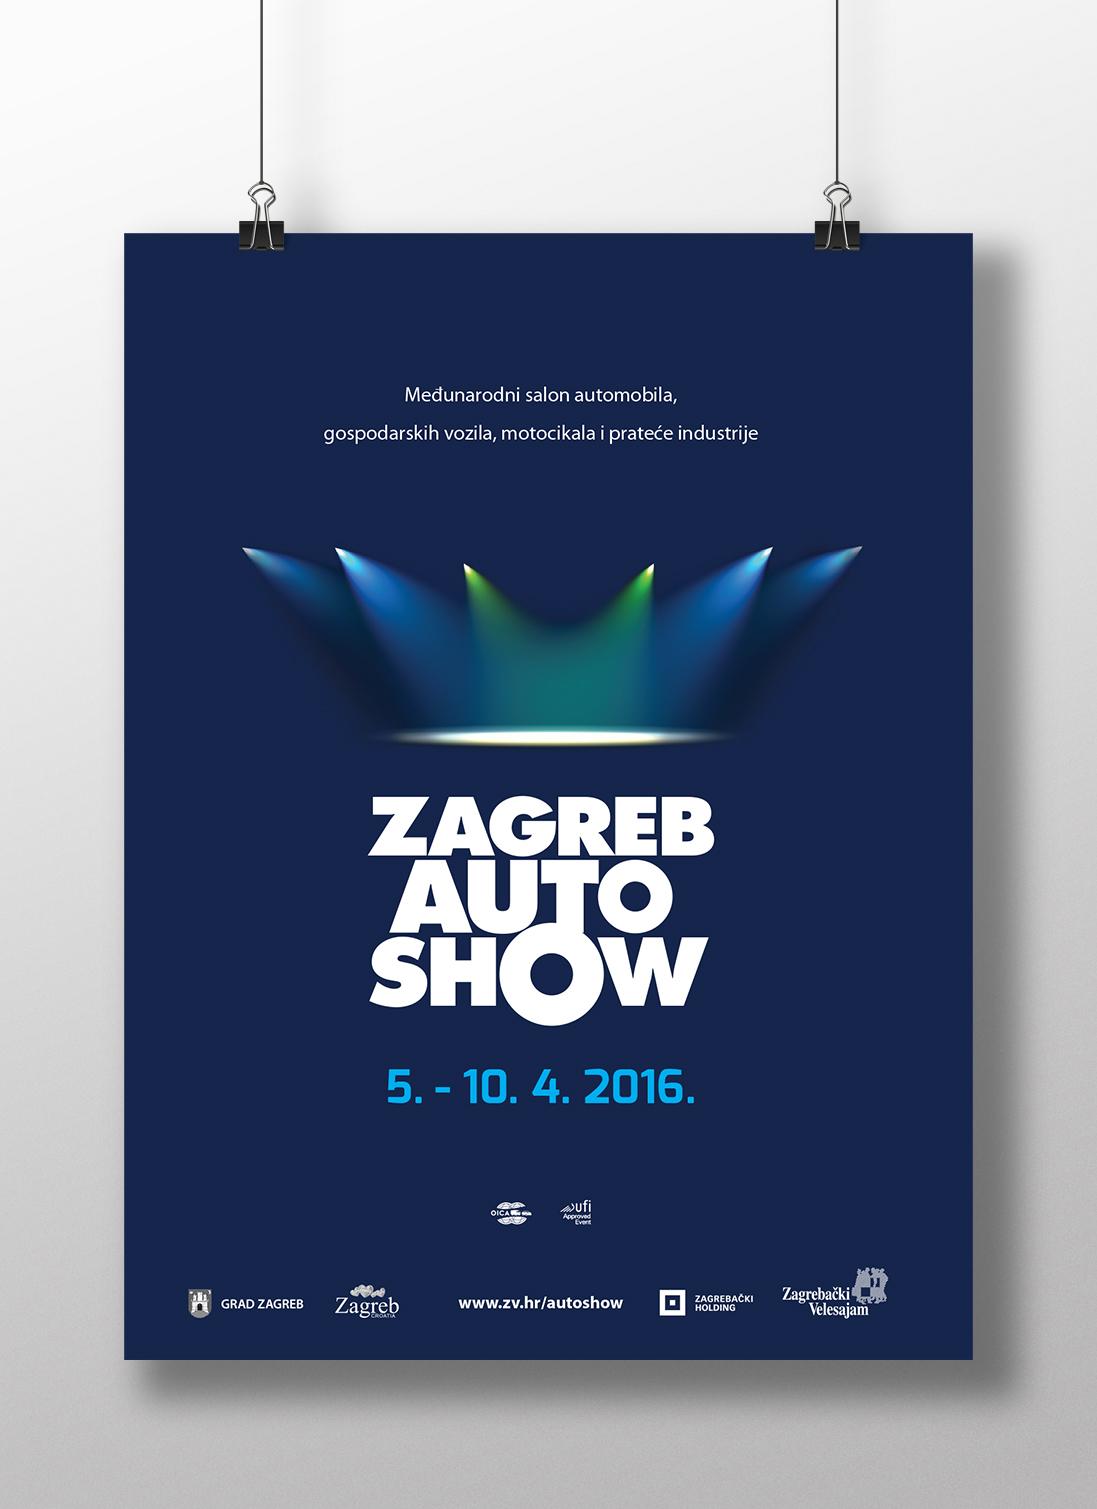 Zagreb Auto Show 2016 poster